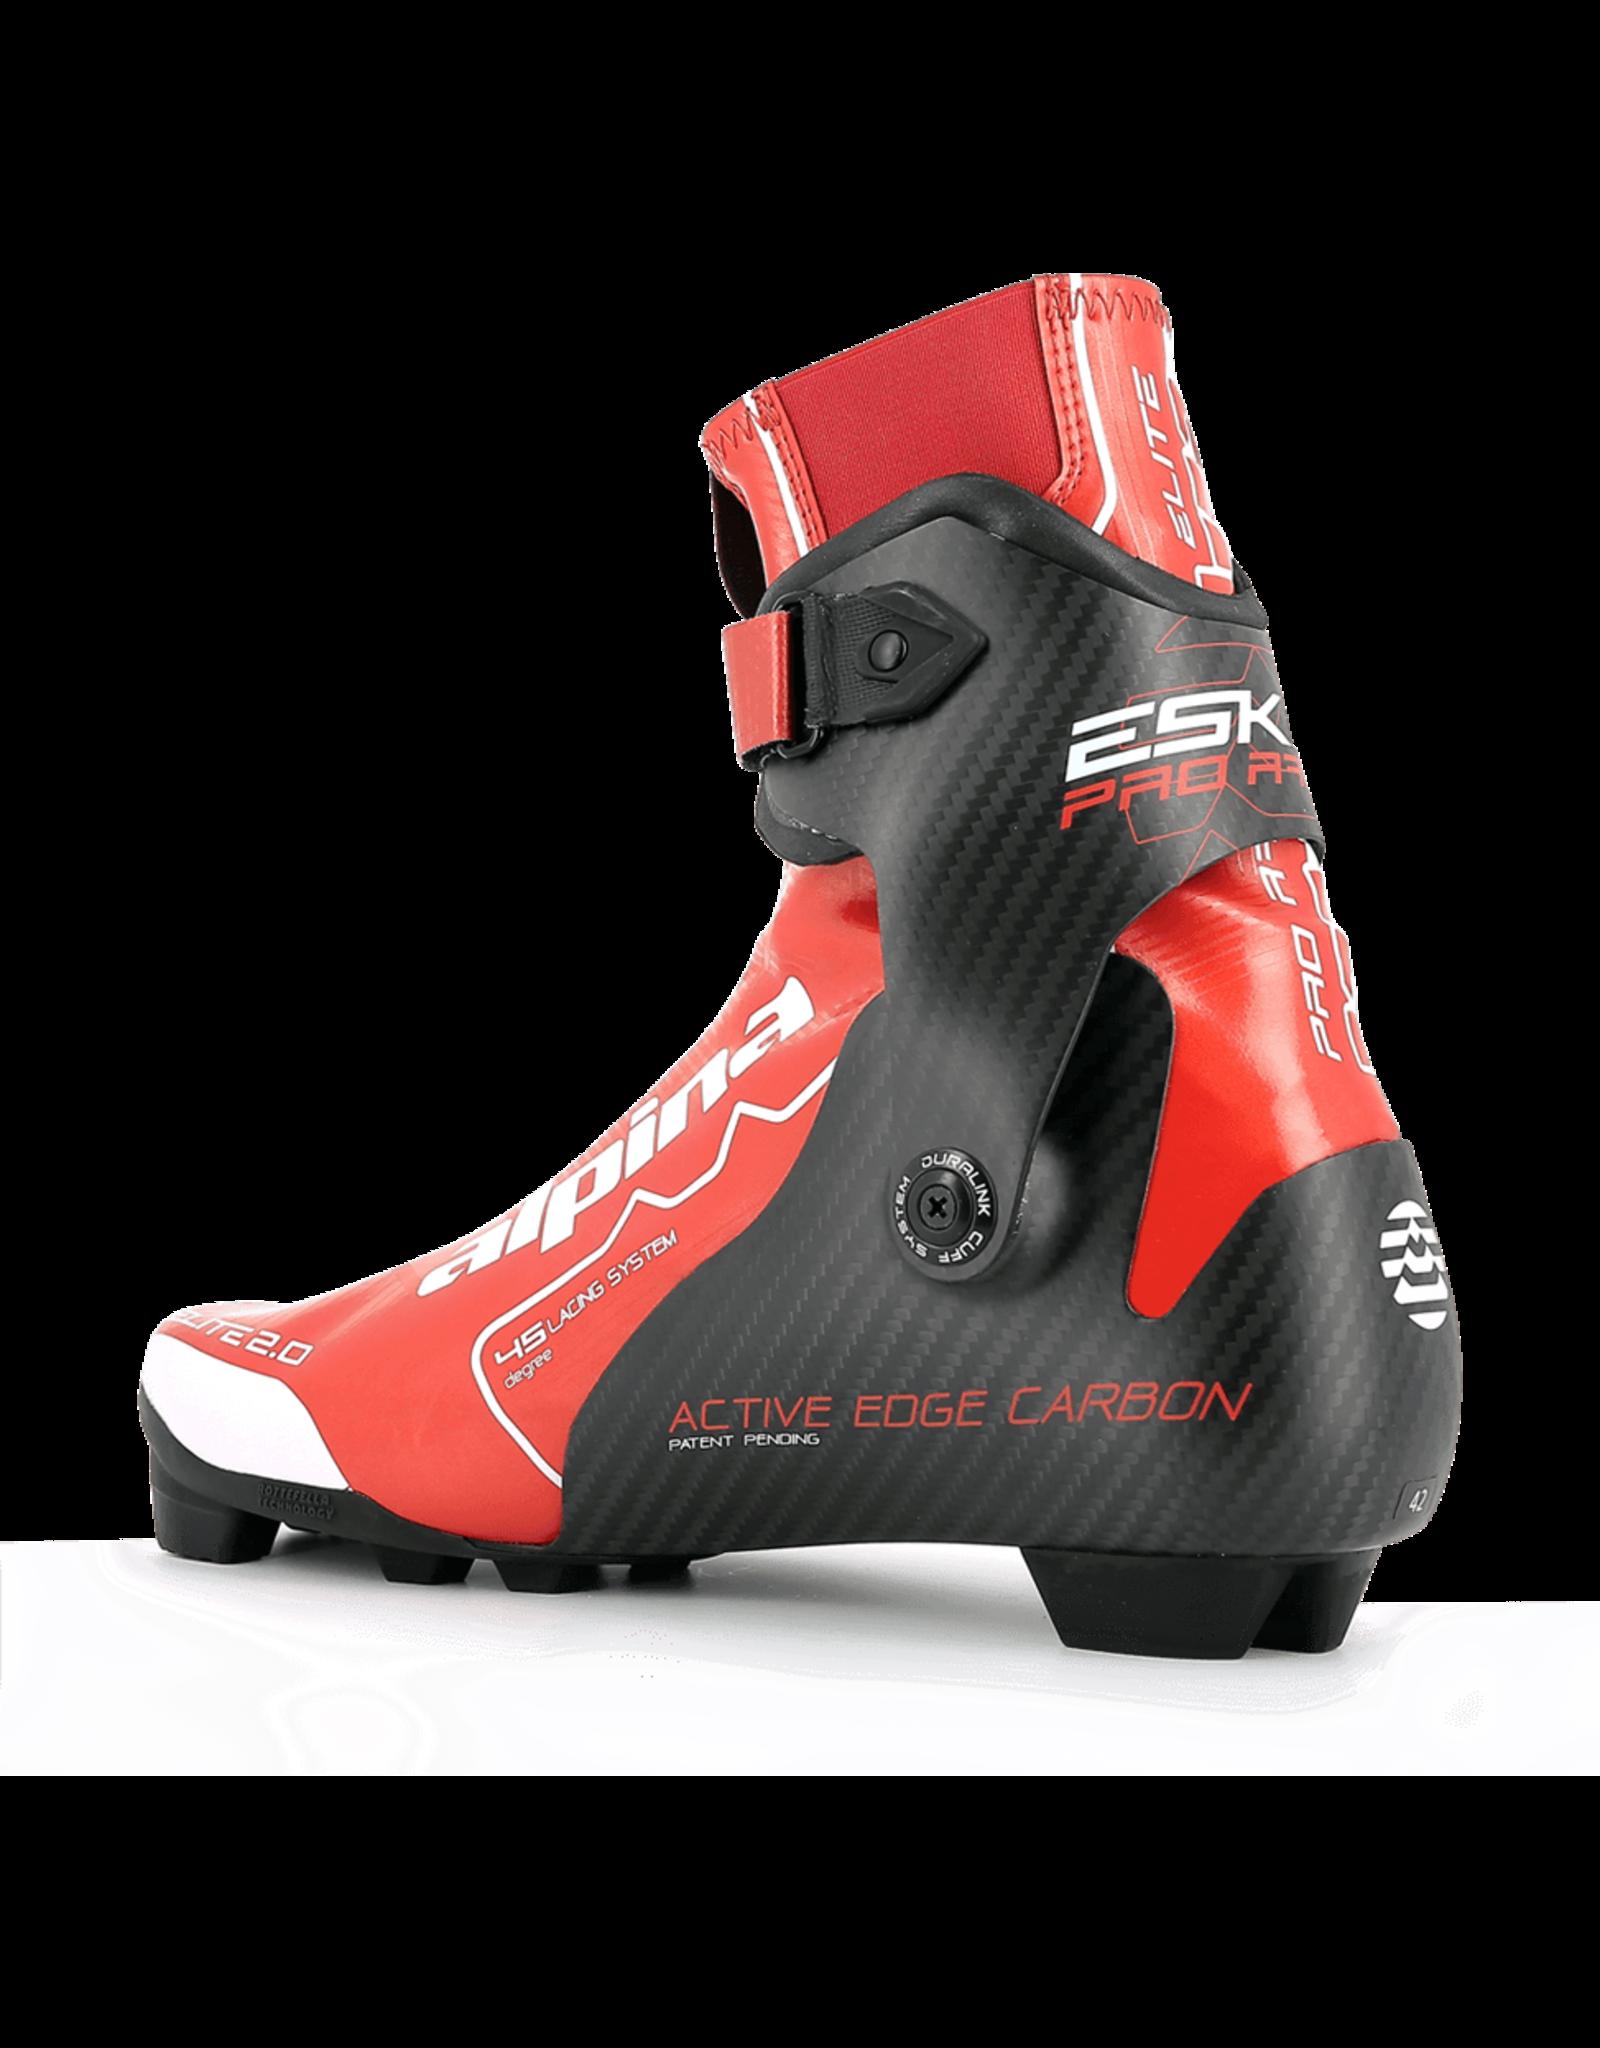 Alpina Alpina ESK 2.0 Skate Boots